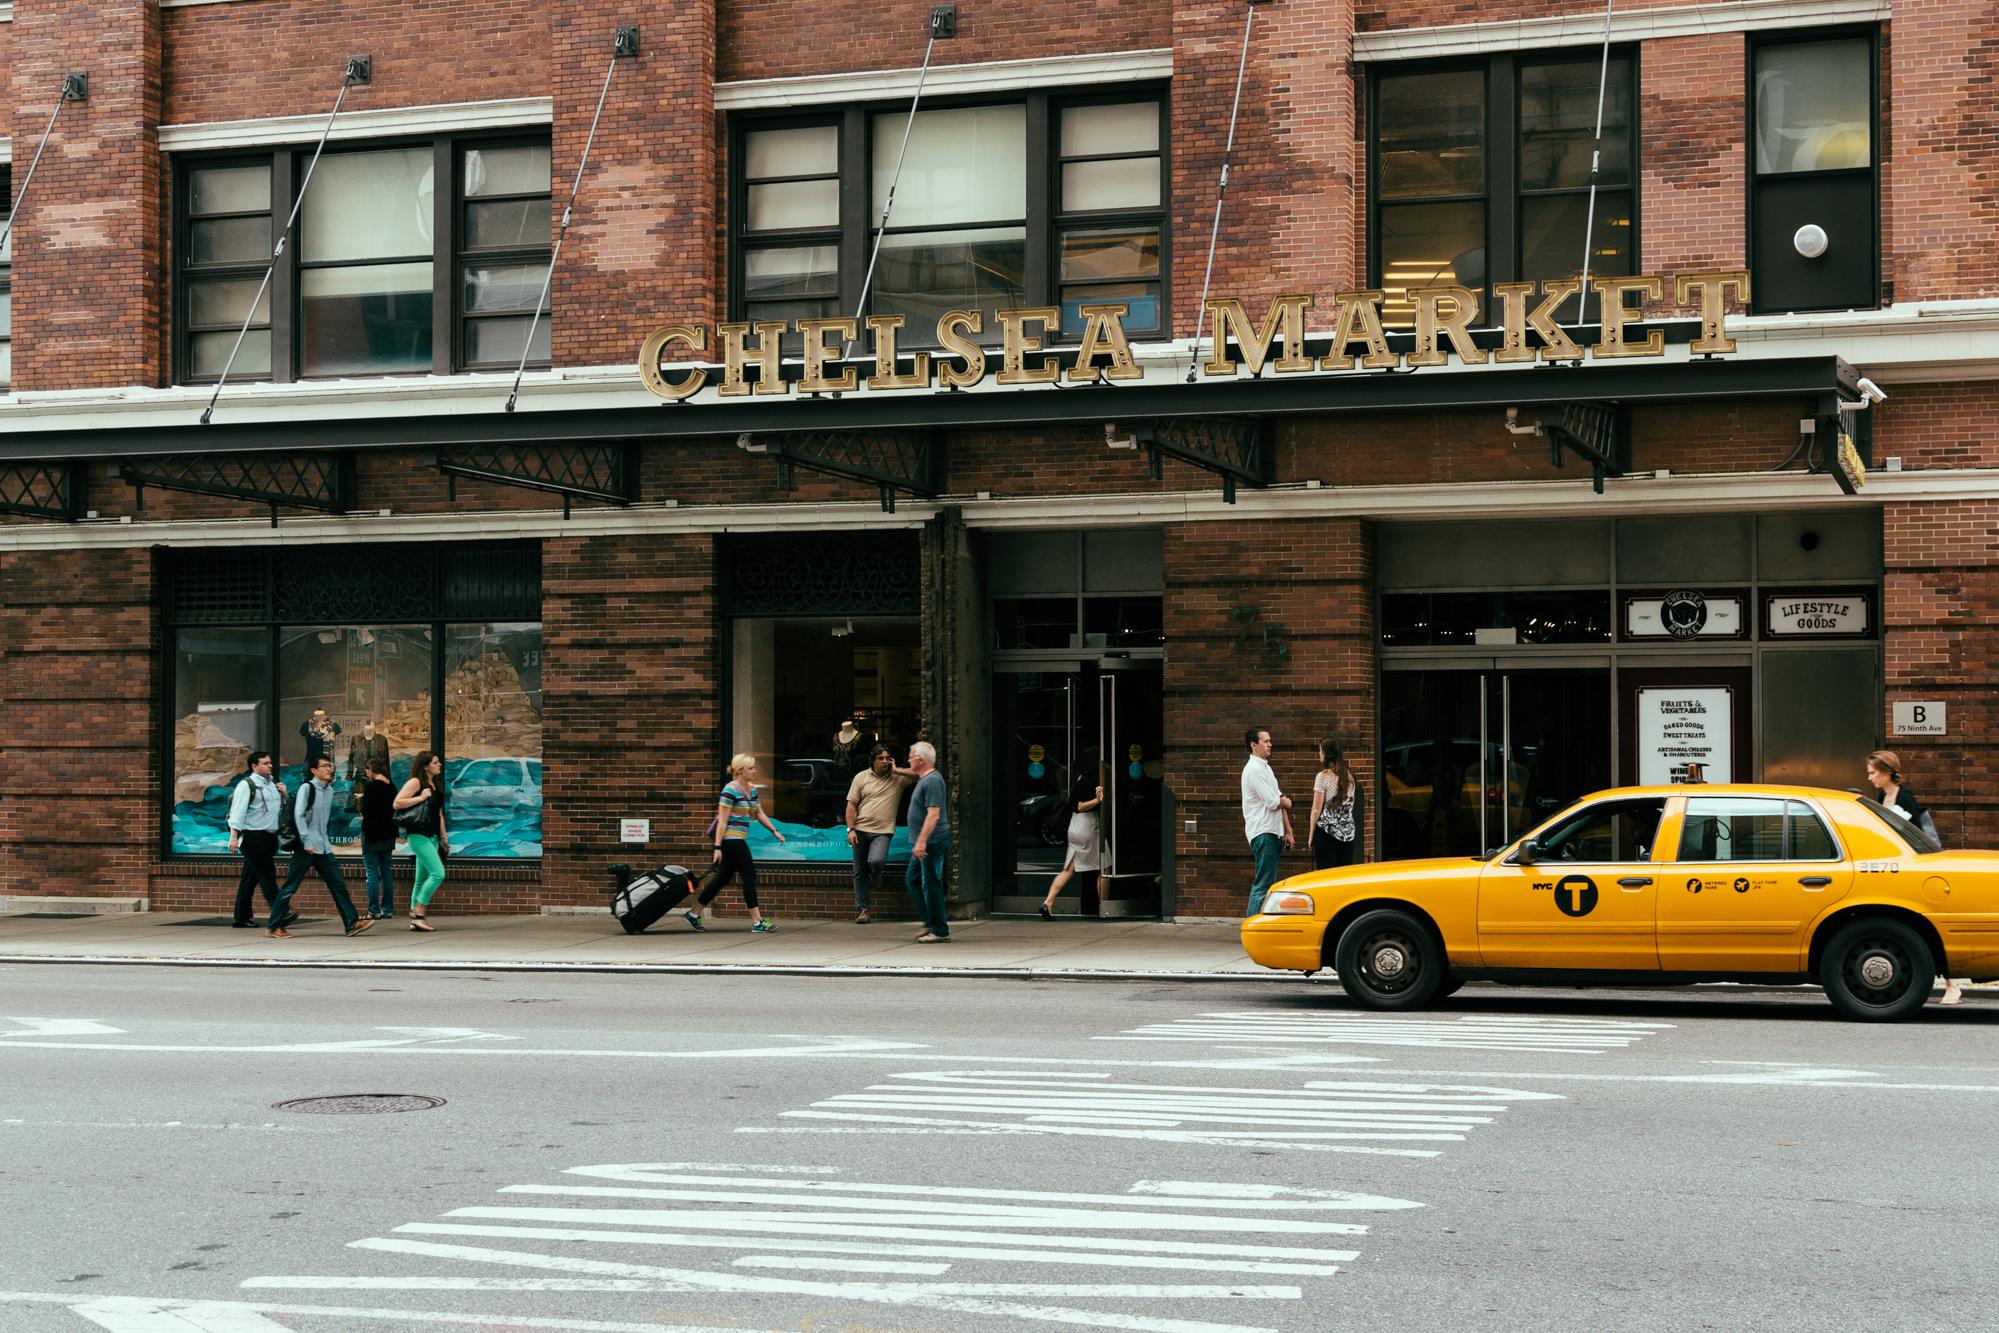 New York City Chelsea Market Exterior